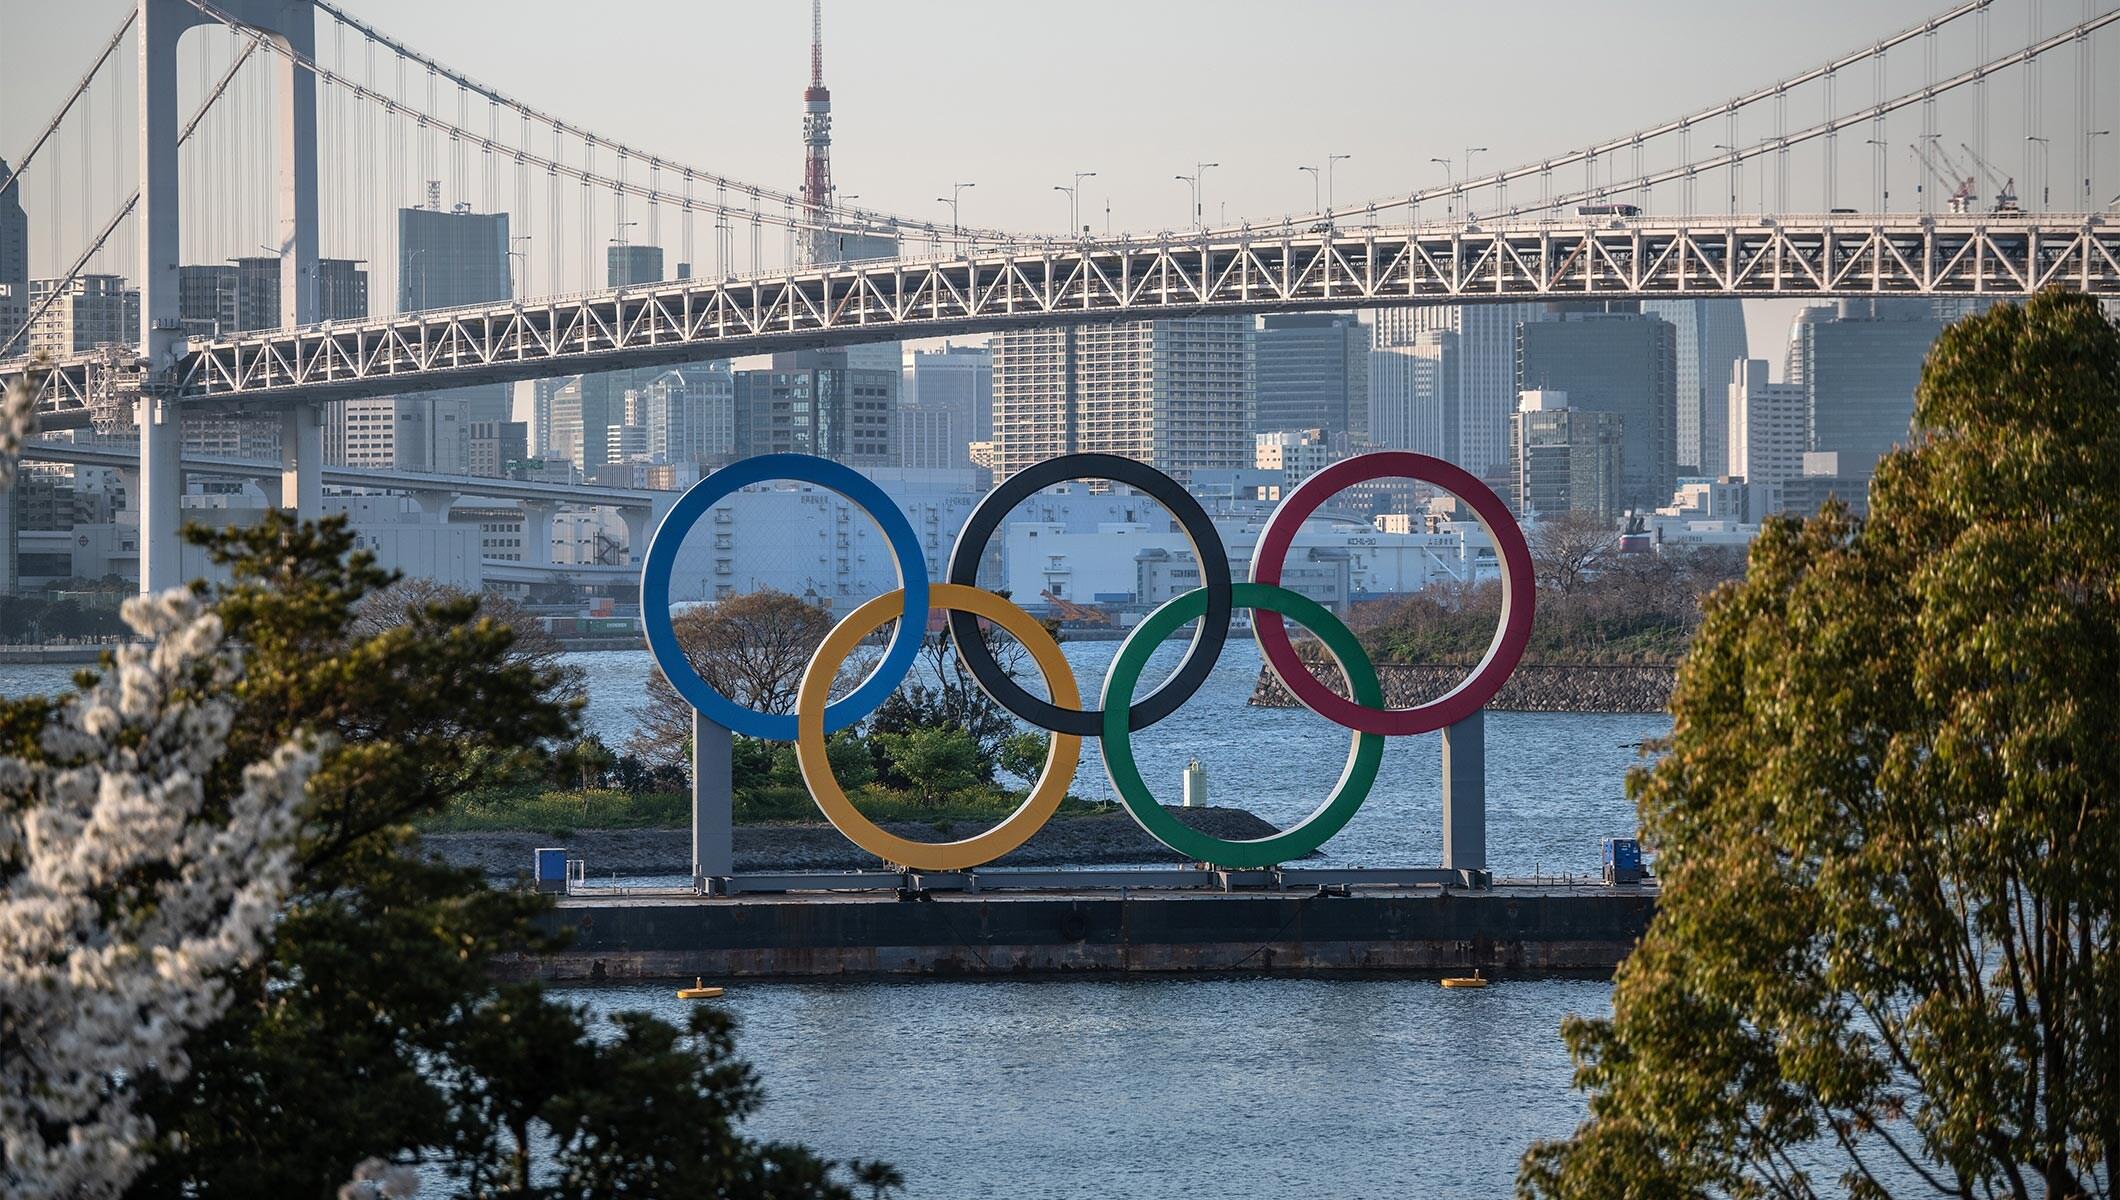 COI realizará maratón de recuerdos en Tokio durante otoño 2022